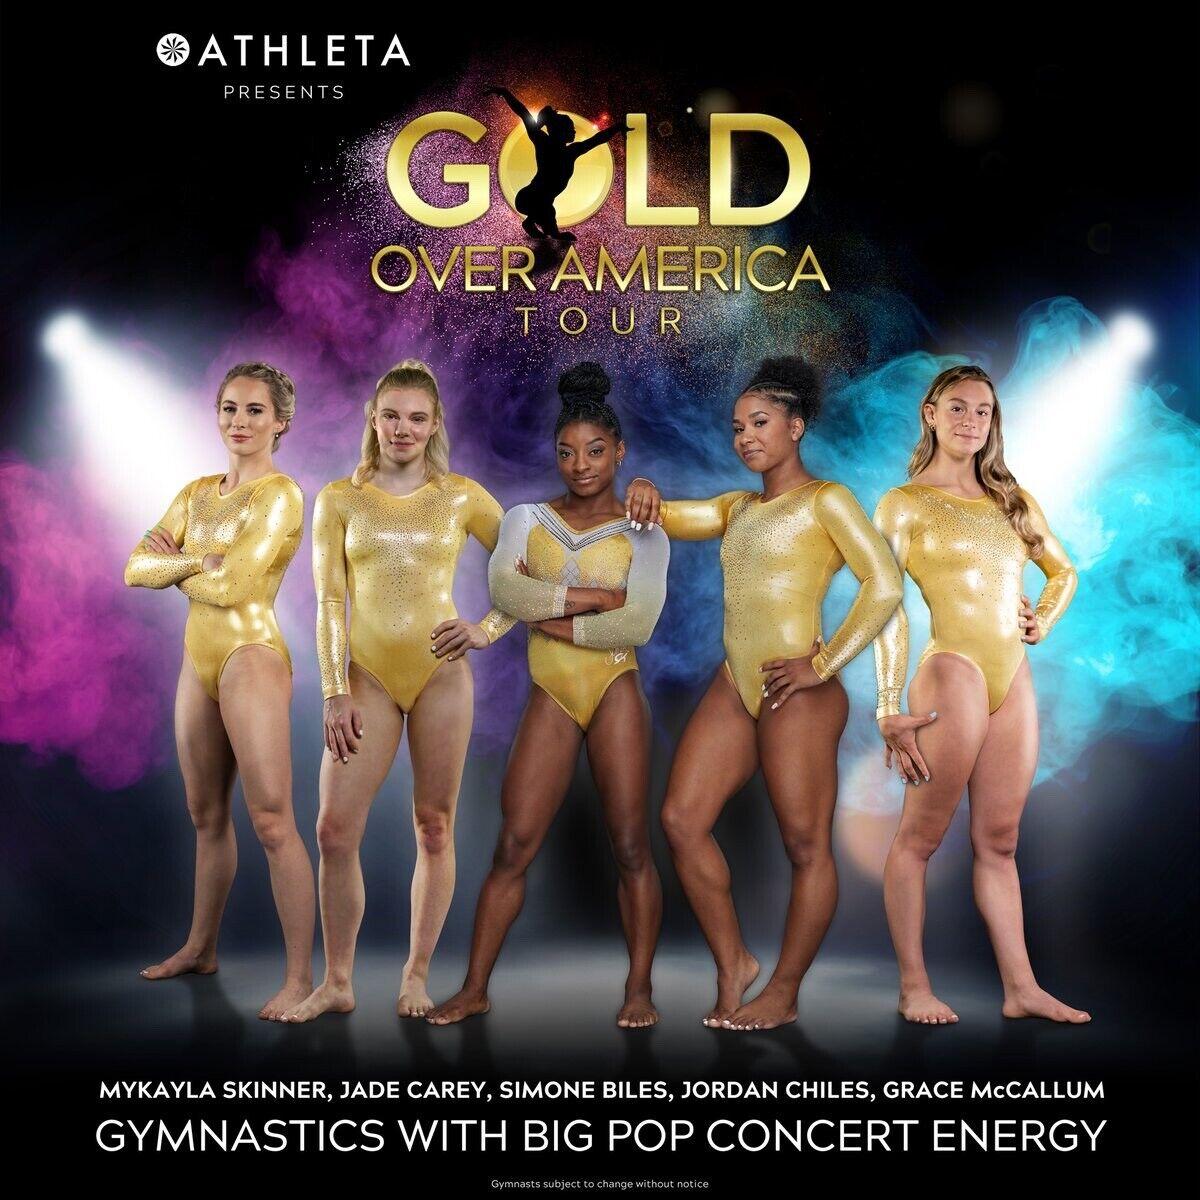 Gold Over America Tickets. Meet Simone Biles. Gymnastics. Event. 2 Tickets. VIP  - $380.00